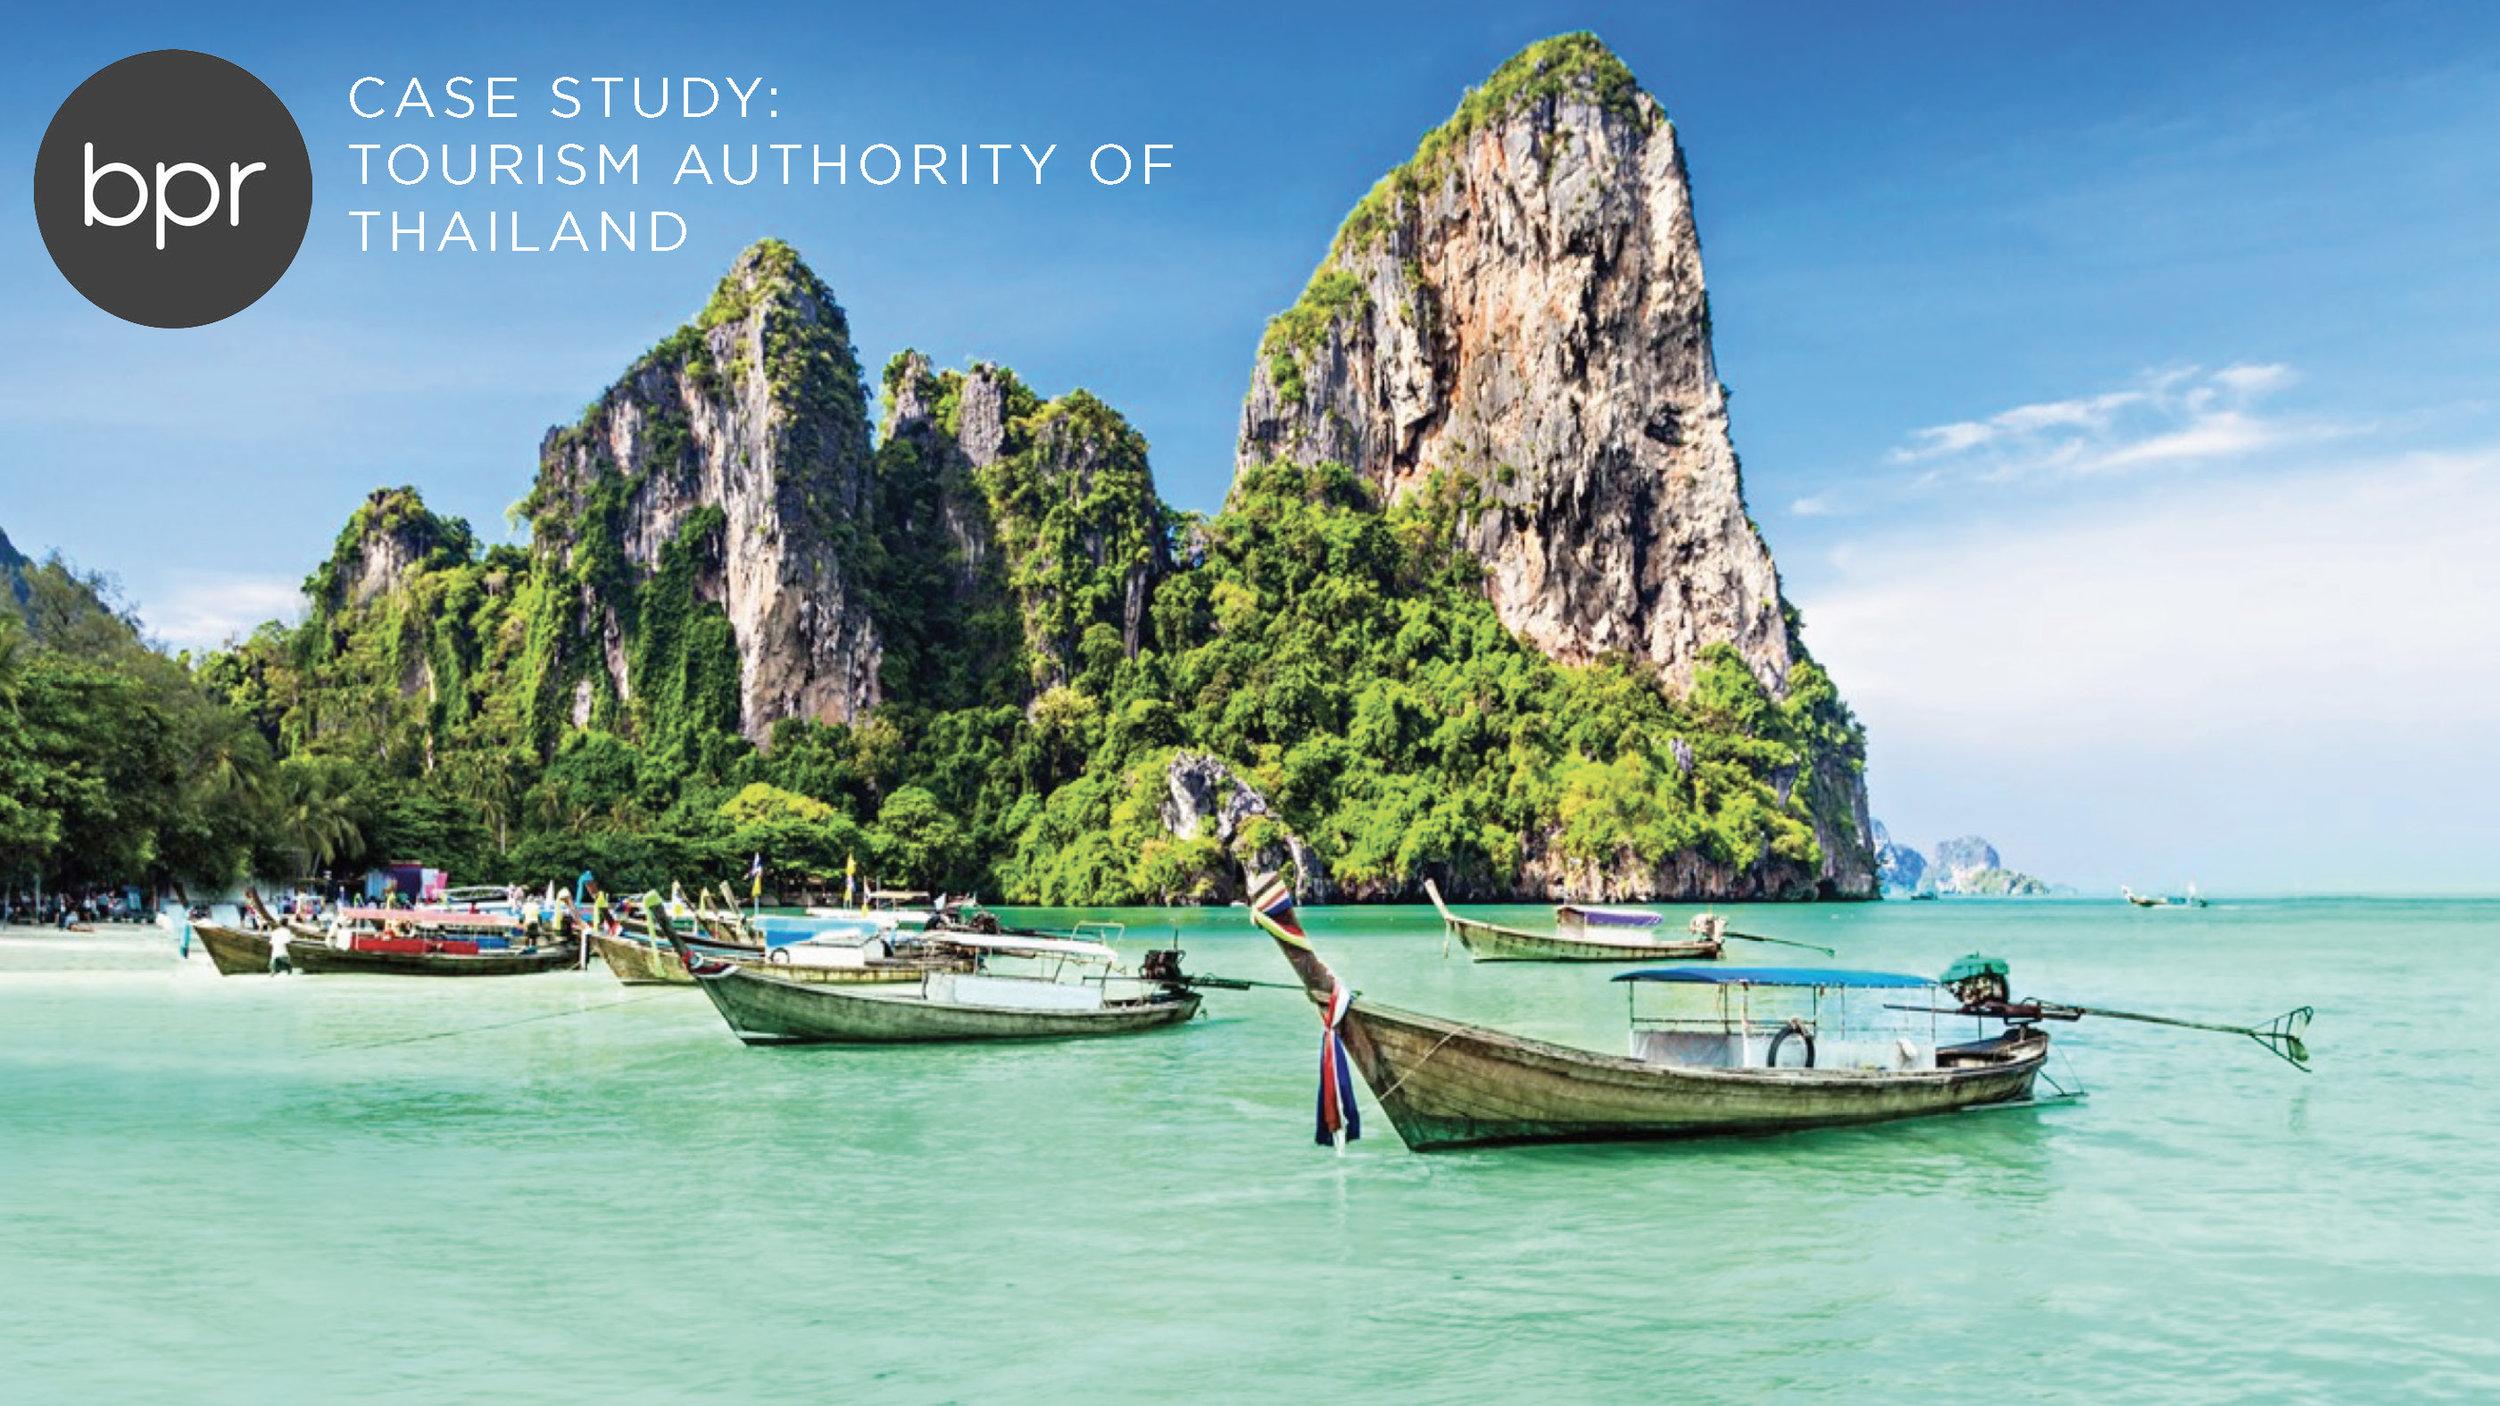 Thailand Tourism Case Study_Page_1.jpg